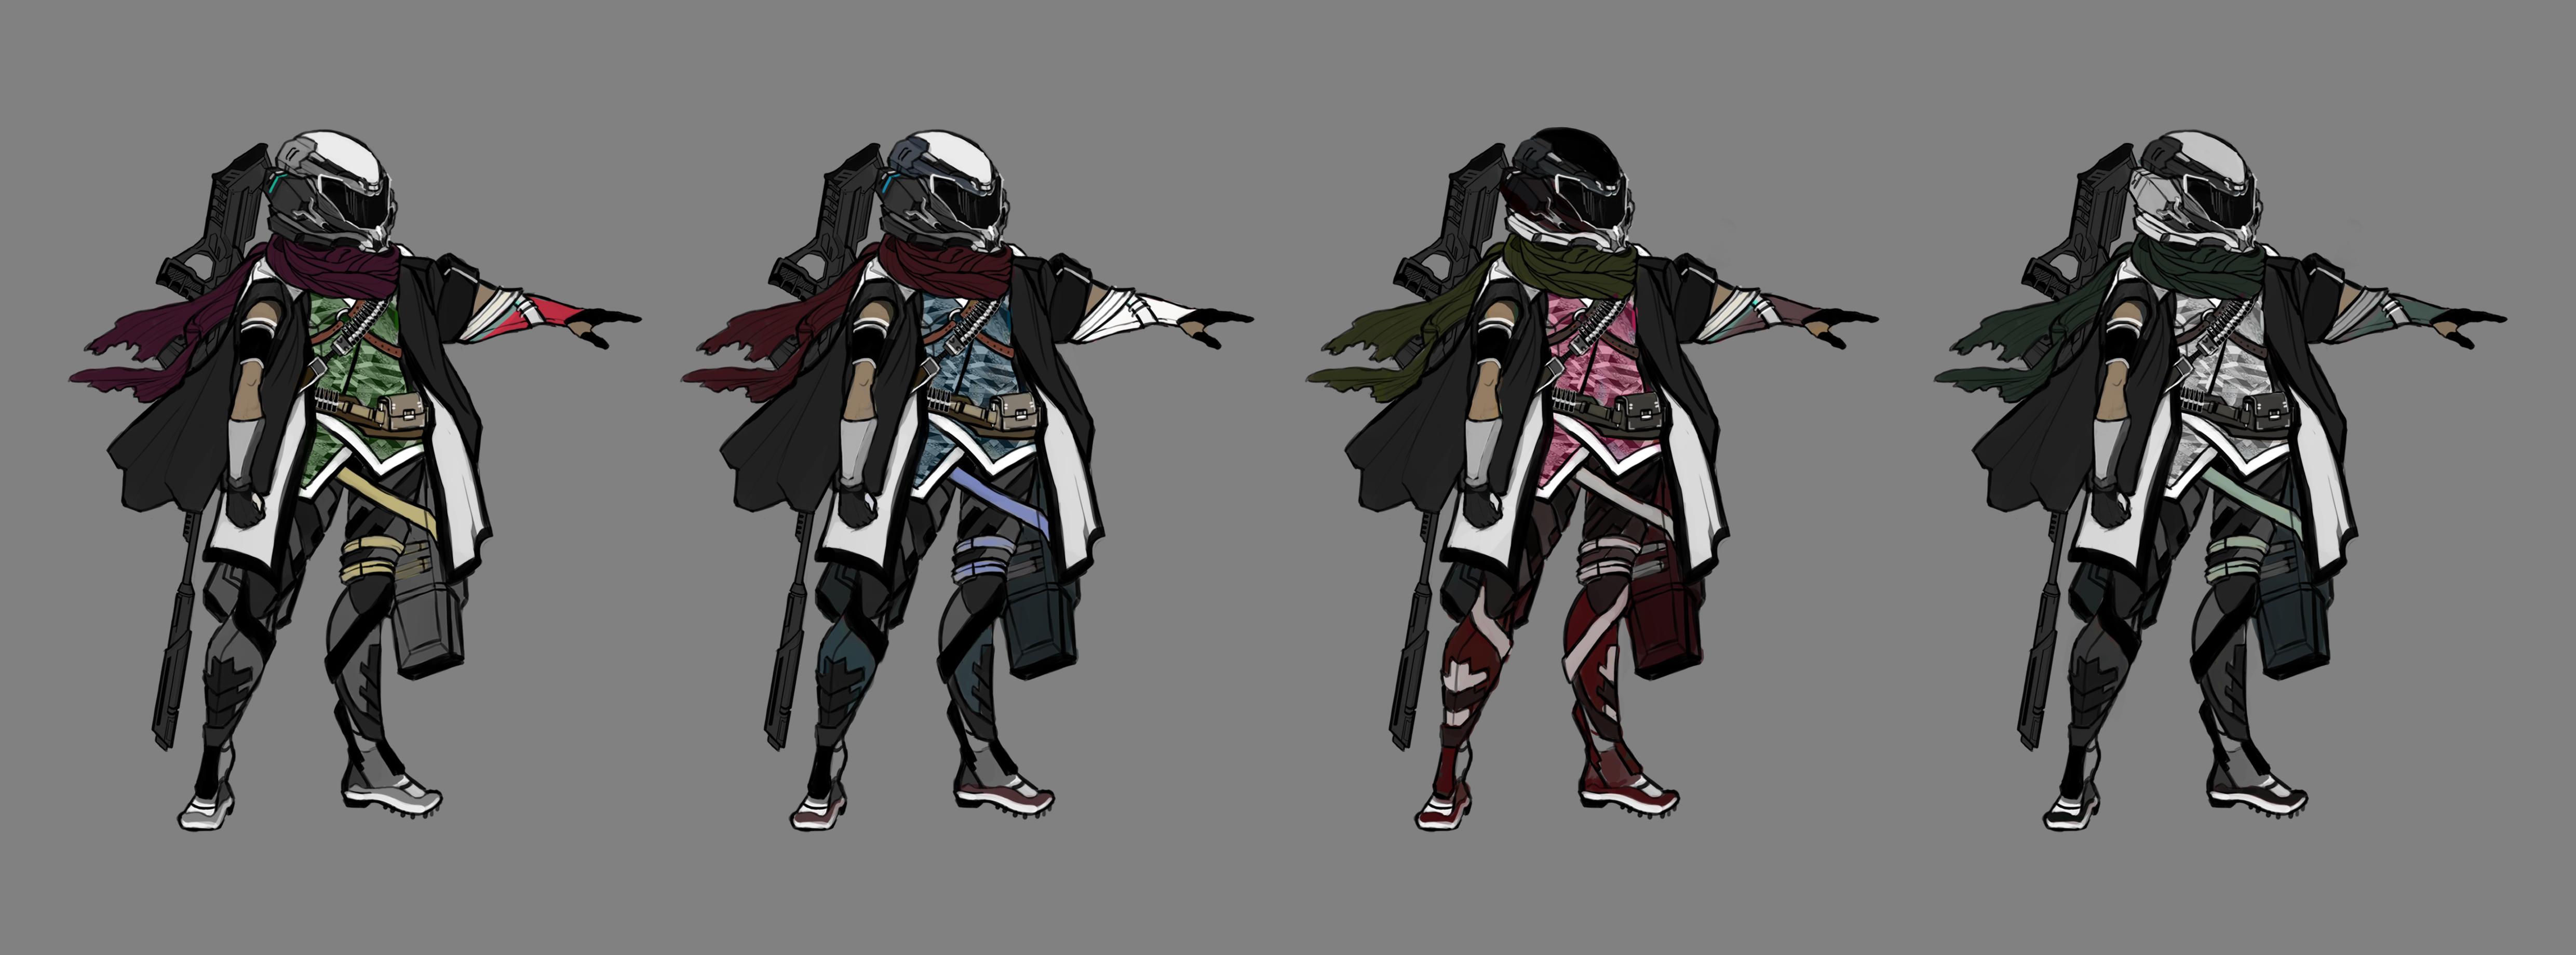 Apocalyptic Sniper Concept Design